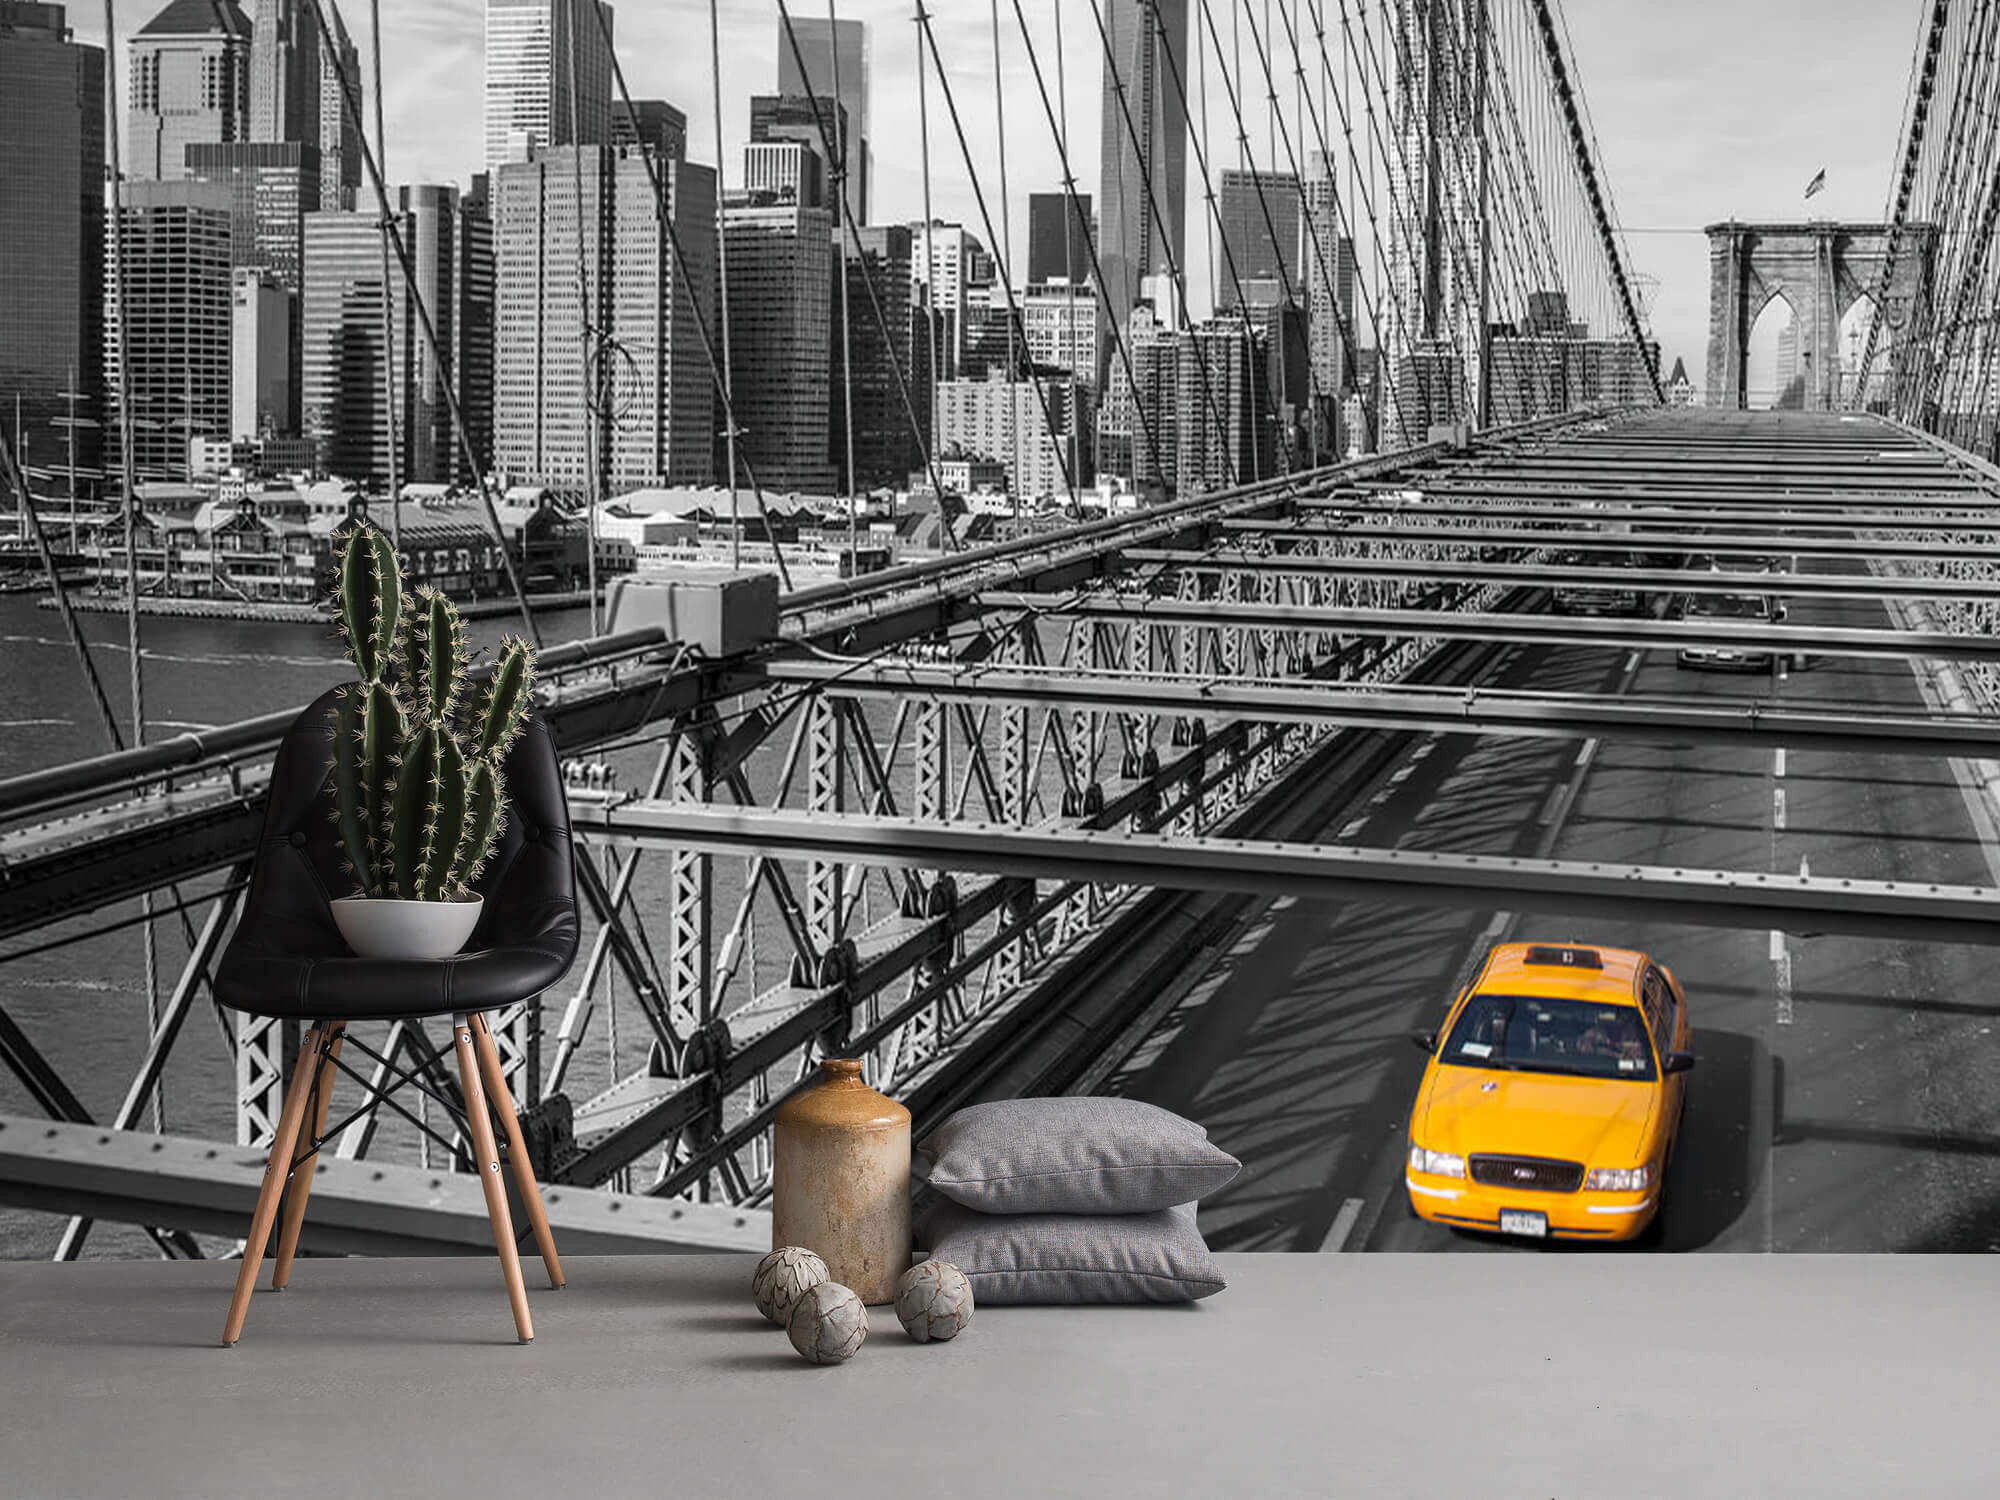 Un taxi sur le pont de Brooklyn 10